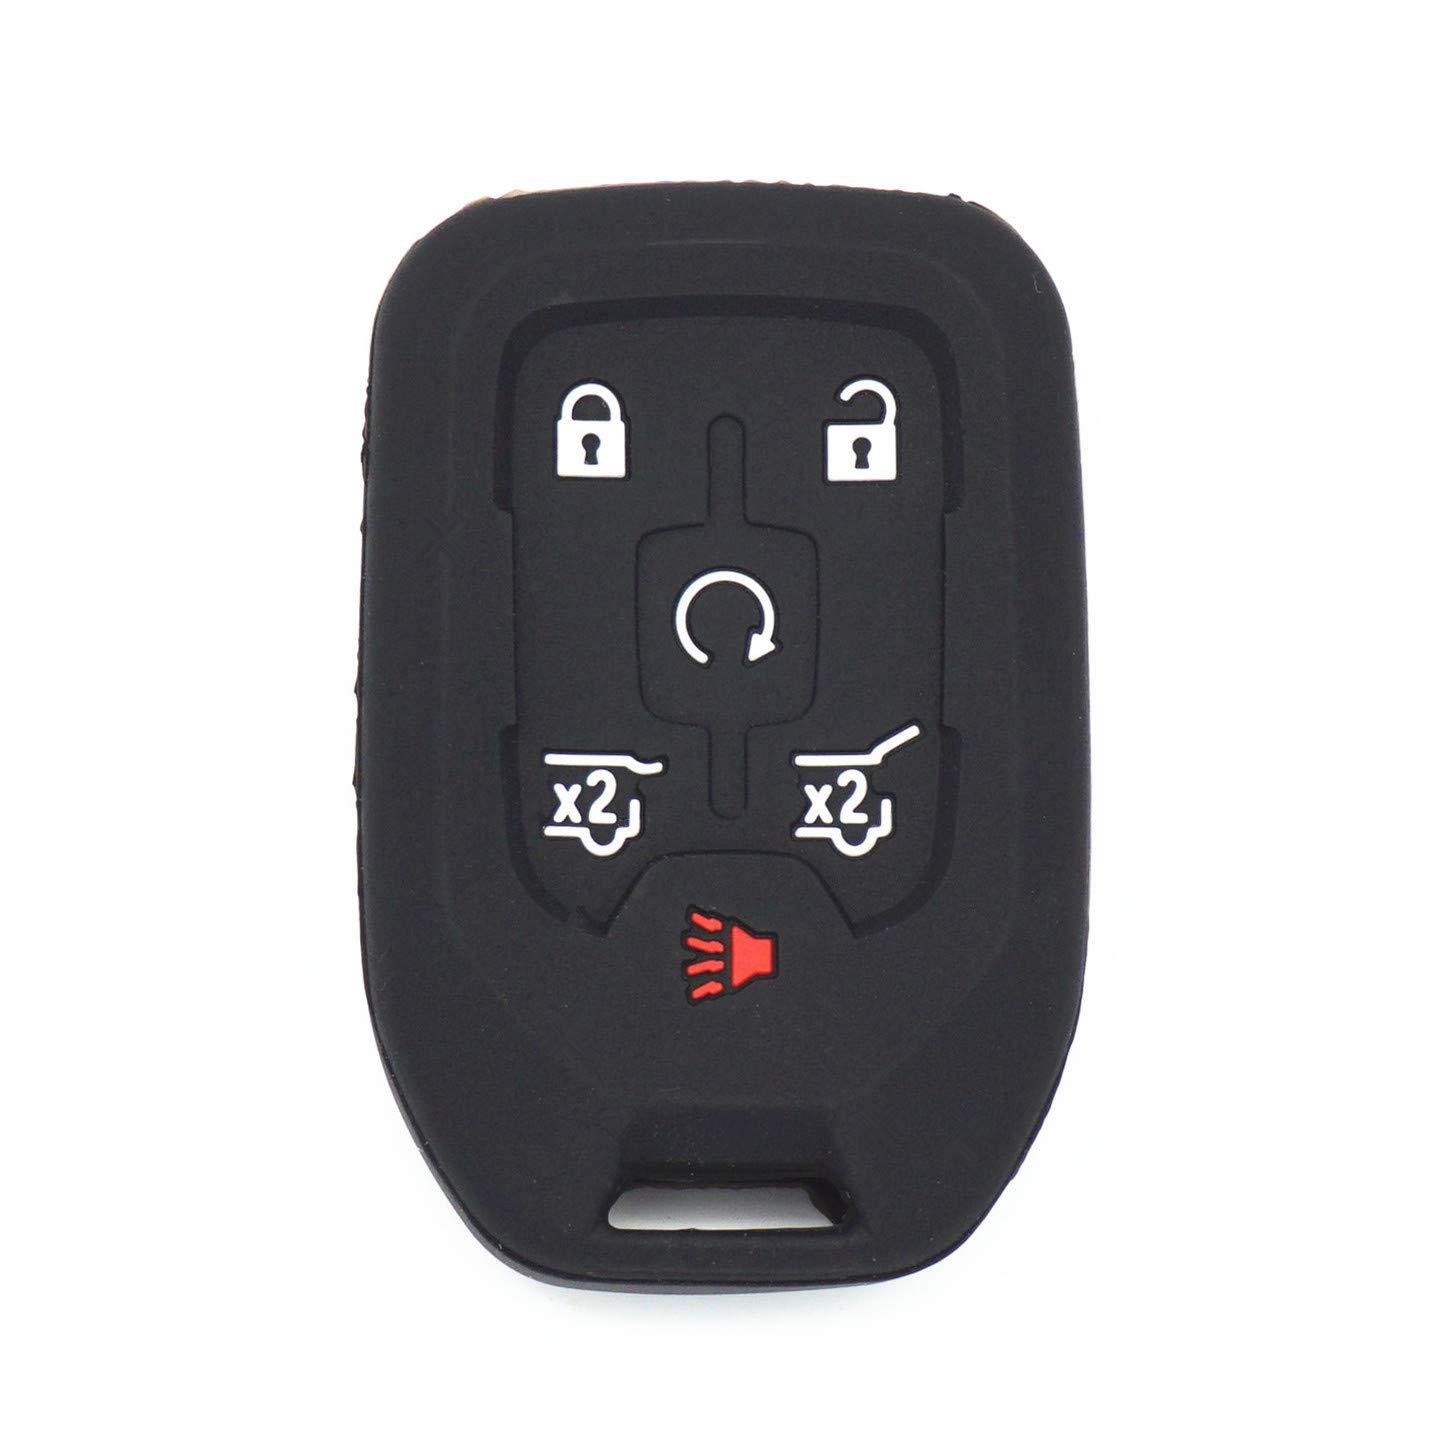 WFMJ 2Pcs Black Silicone 6 Buttons Smart Remote Key Case Cover for 2015 2016 2017 Chevrolet Suburban Tahoe GMC Yukon